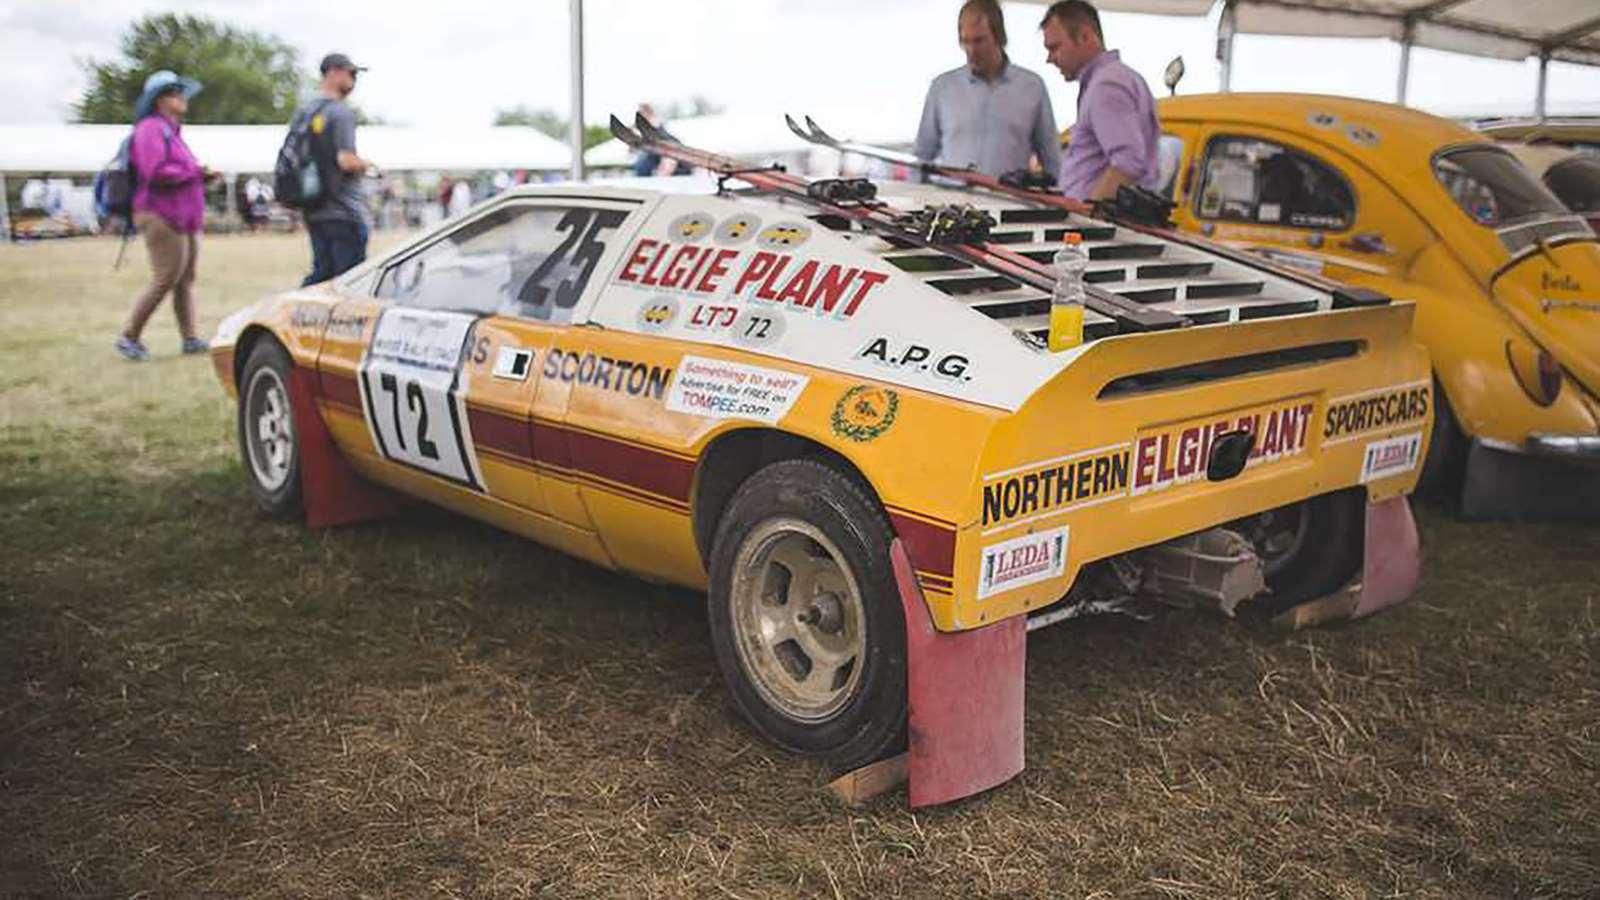 fos-2015-lotus-esprit-rally-car-goodwood-25042002.jpg?crop=(0,211,2600,1674)&width=1600